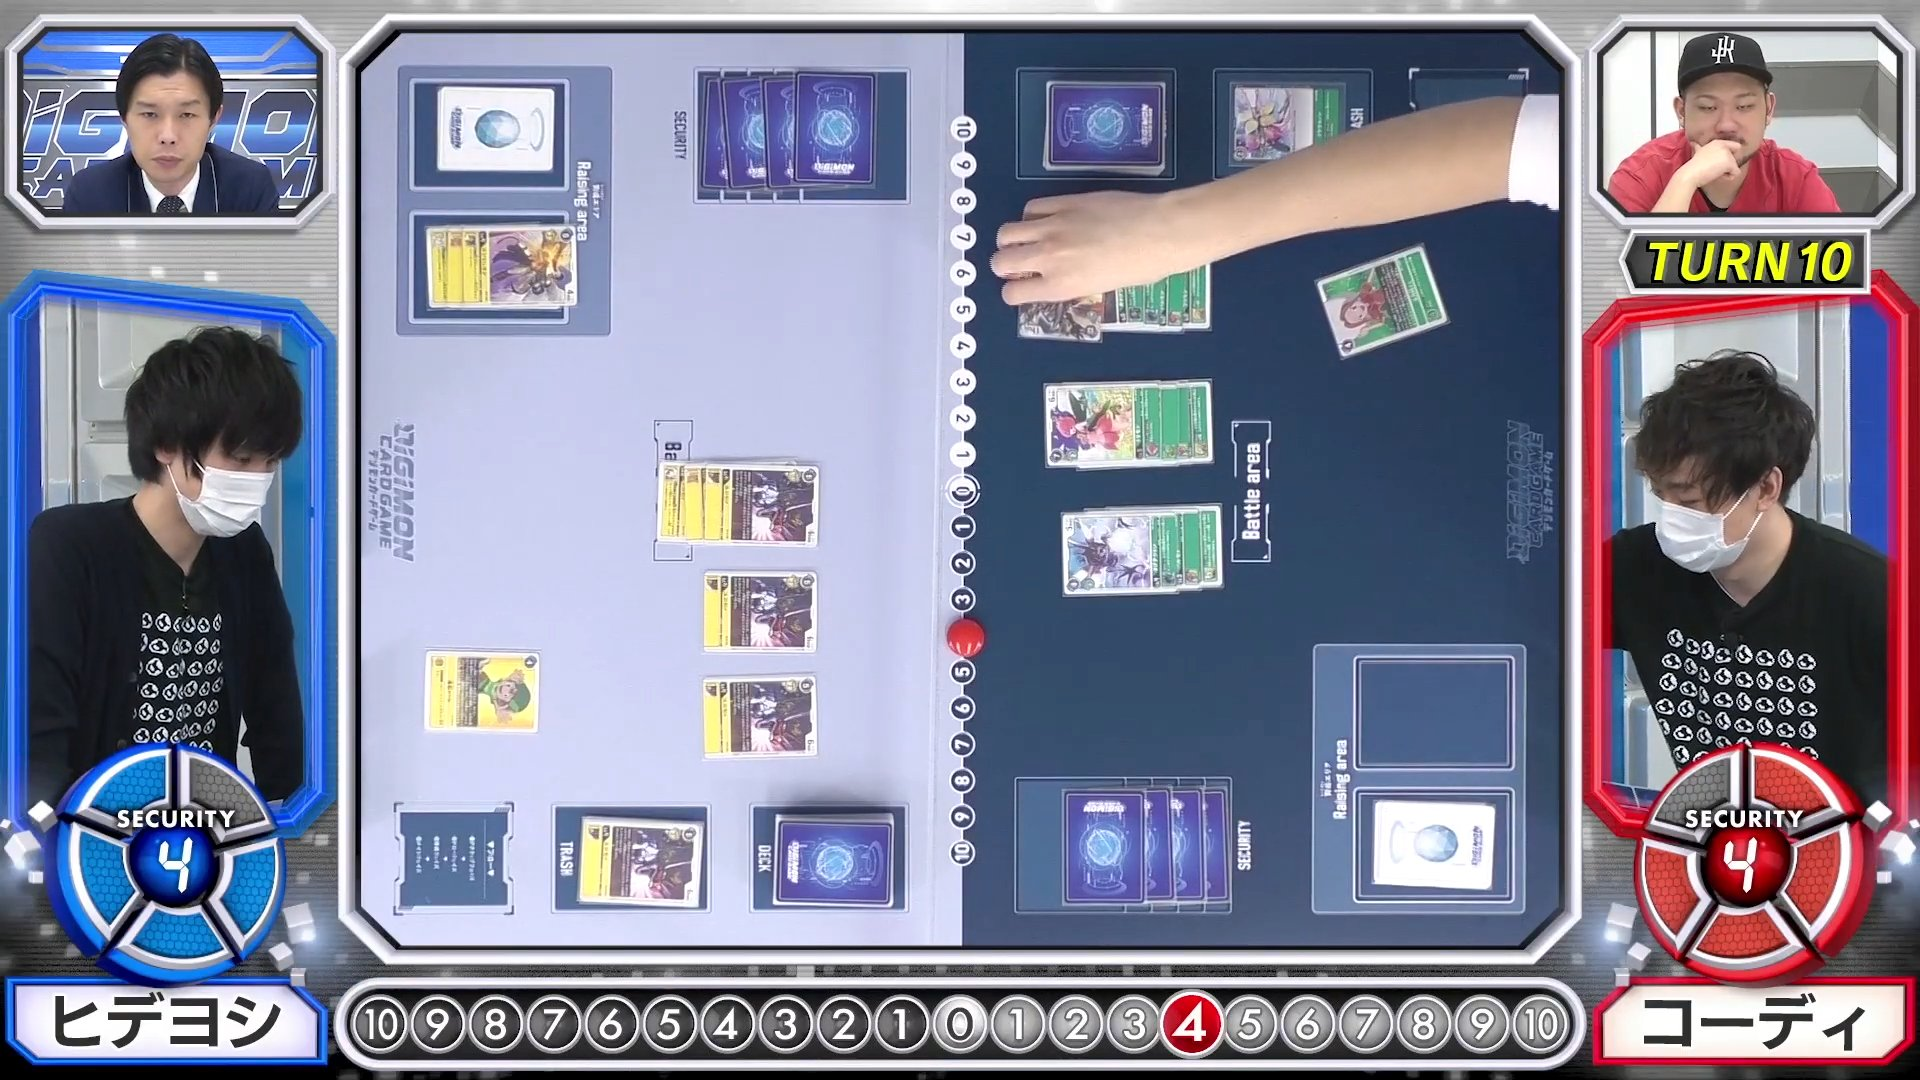 cardgamebattle3_3_may29_2020.jpg